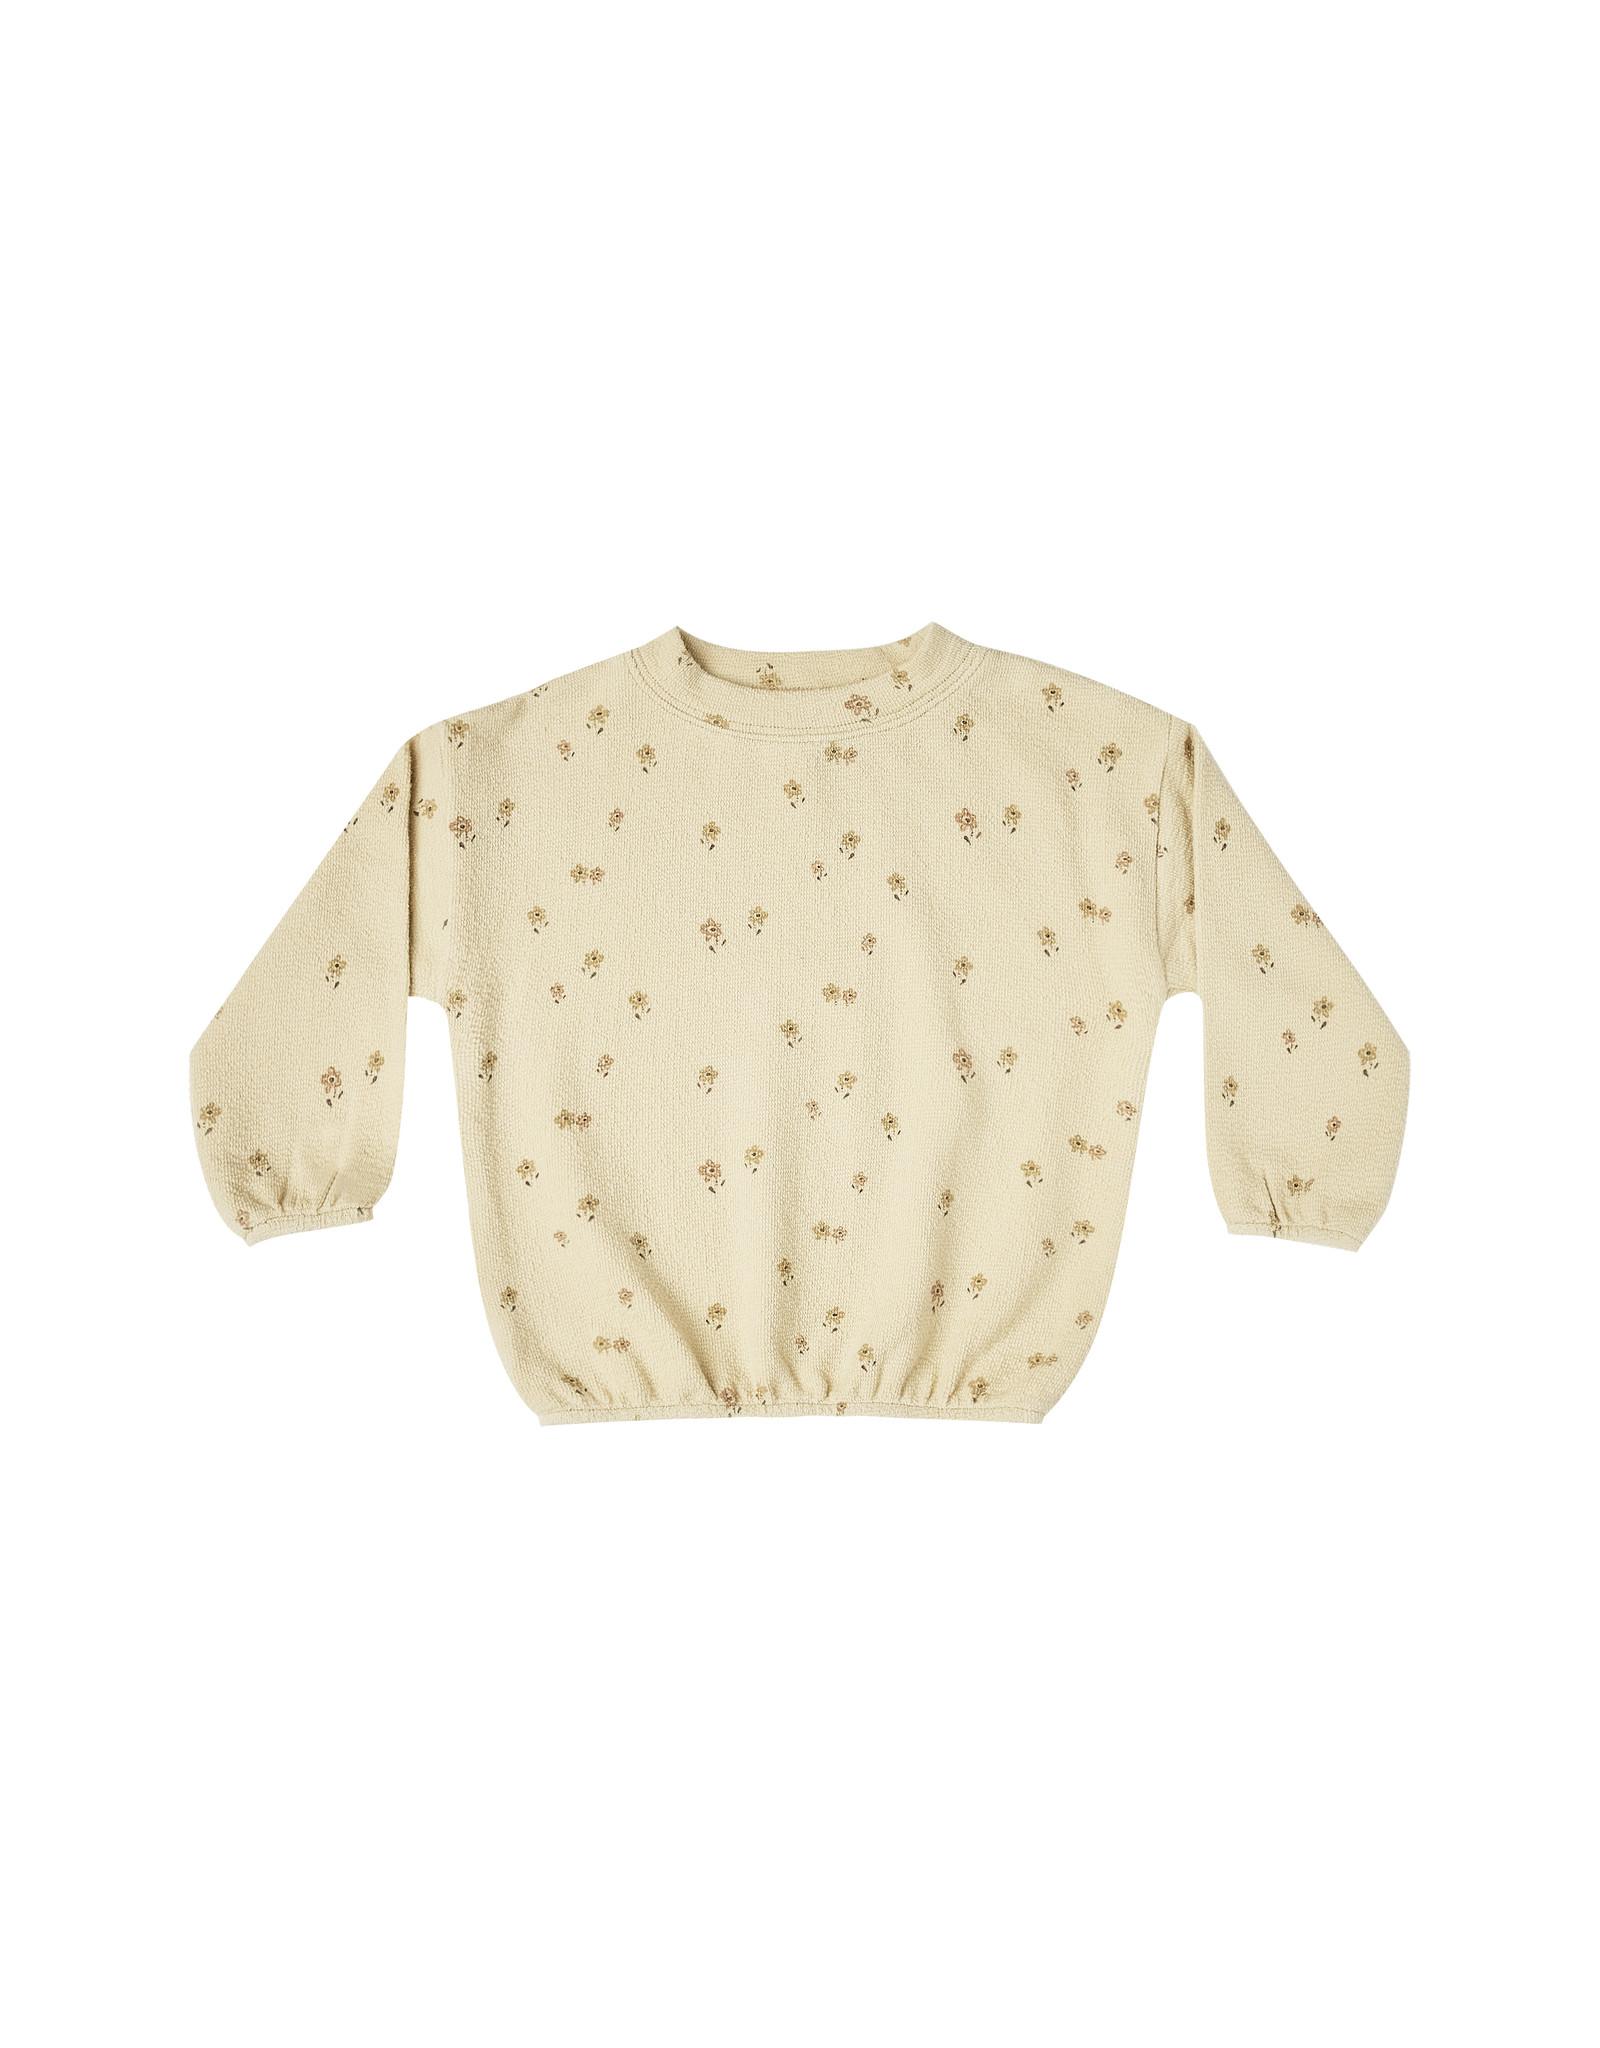 Rylee + Cru Little Flower Slouchy Pullover